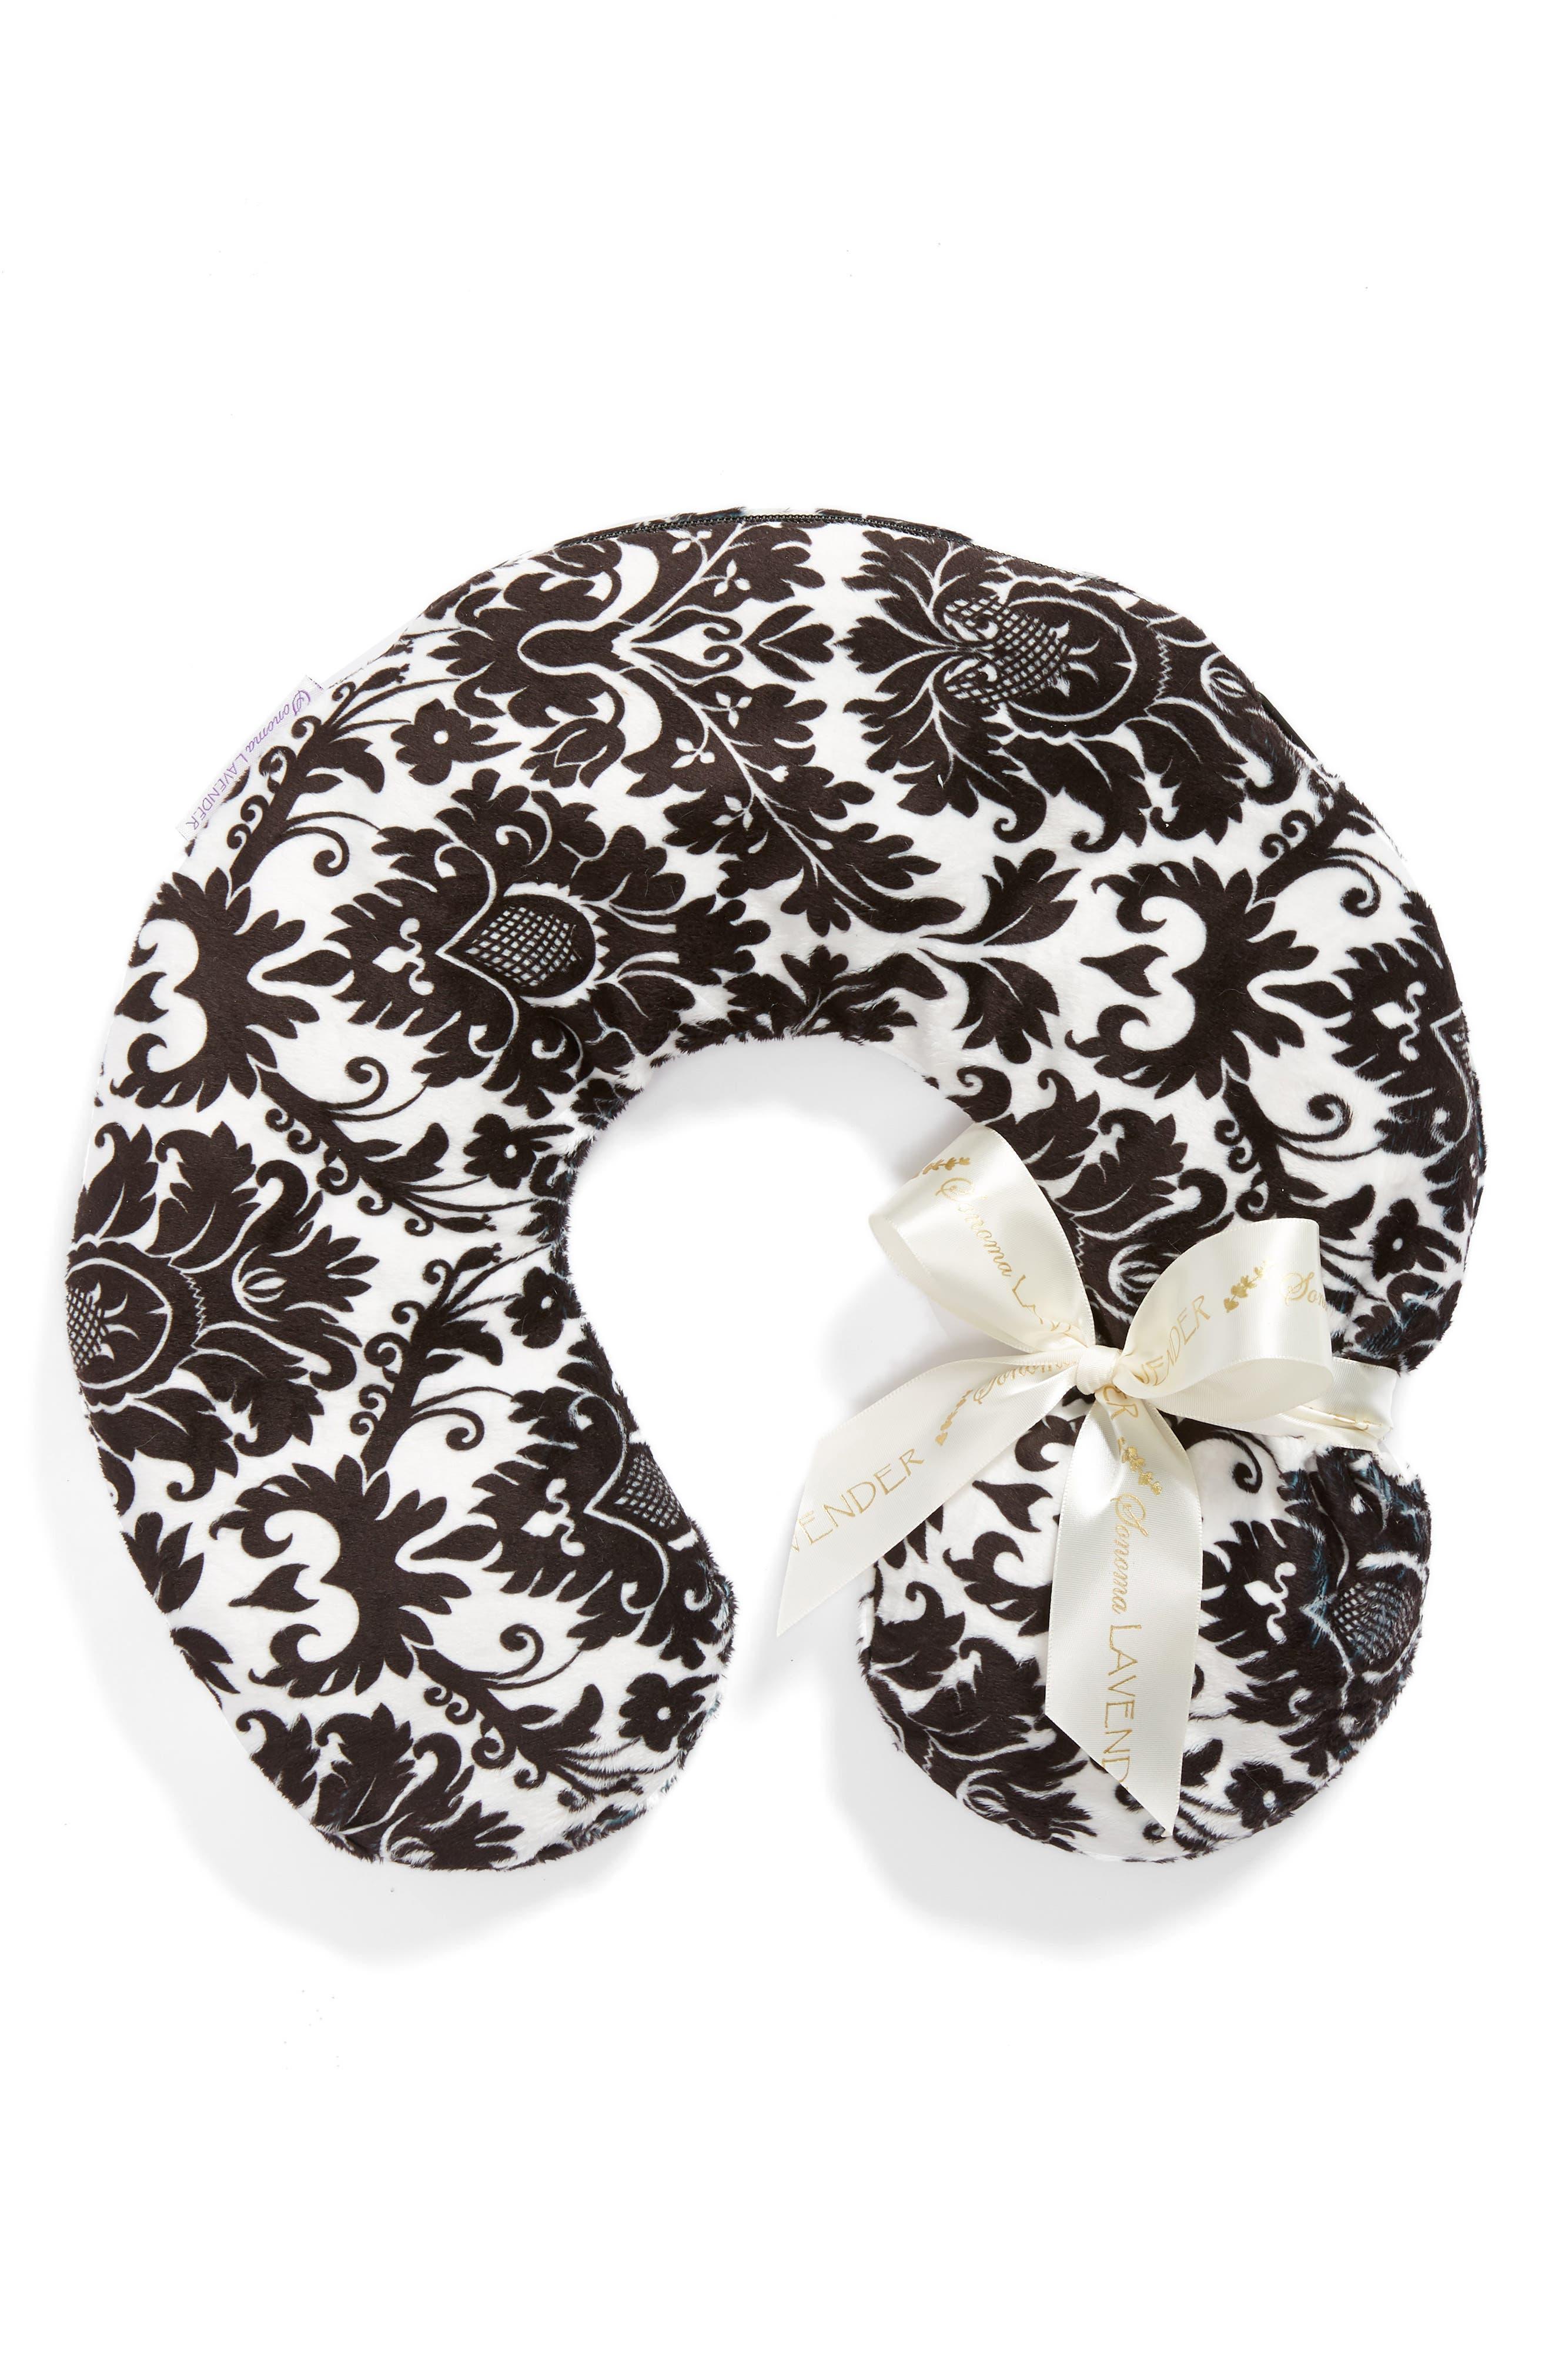 Alternate Image 1 Selected - Sonoma Lavender Black Damask Neck Pillow (Limited Edition)